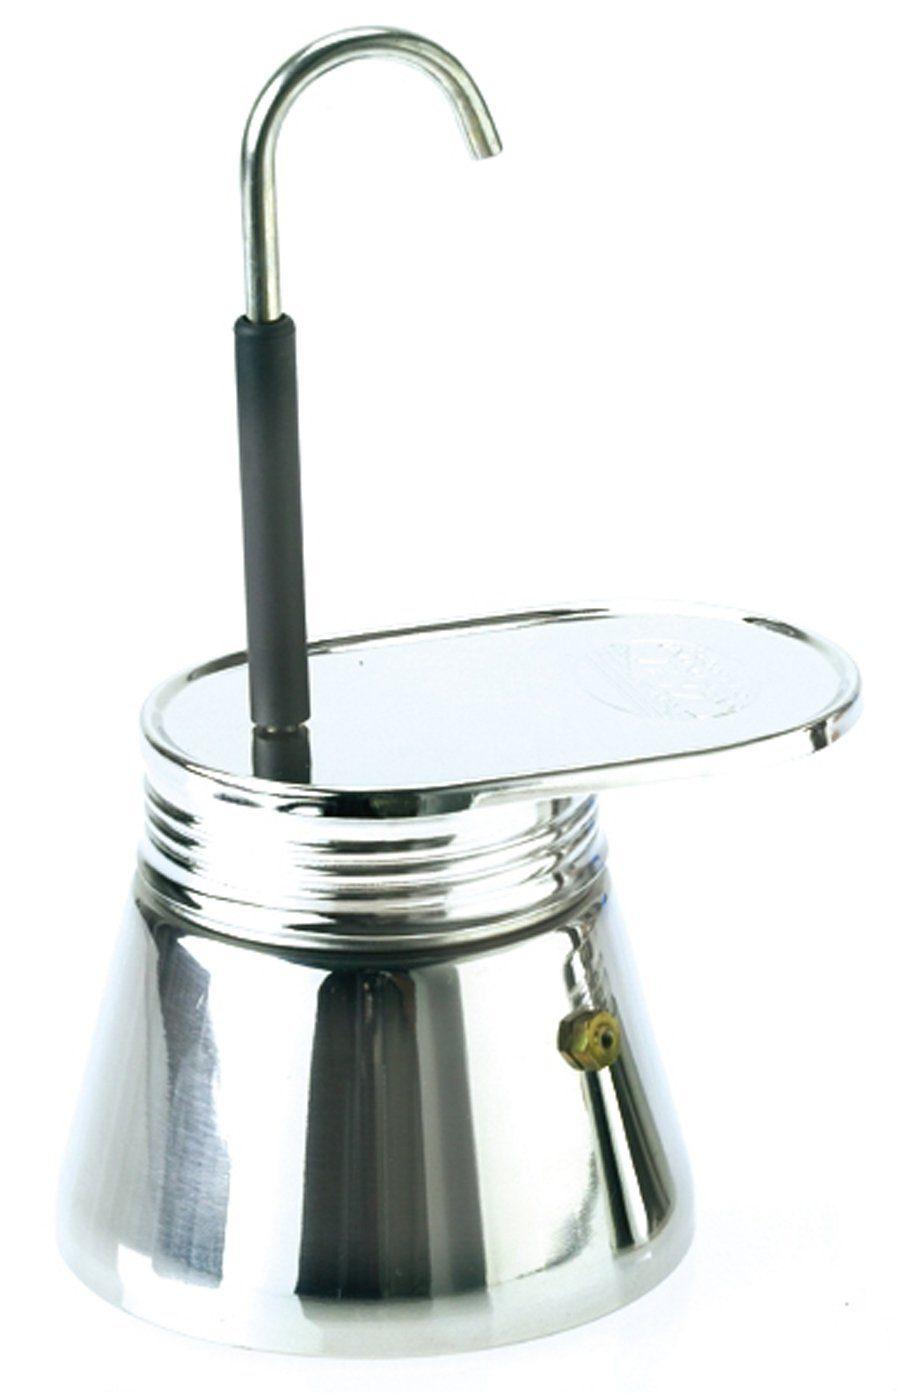 GSI Camping-Geschirr »Espresso Maker Edelstahl 4 Tassen«